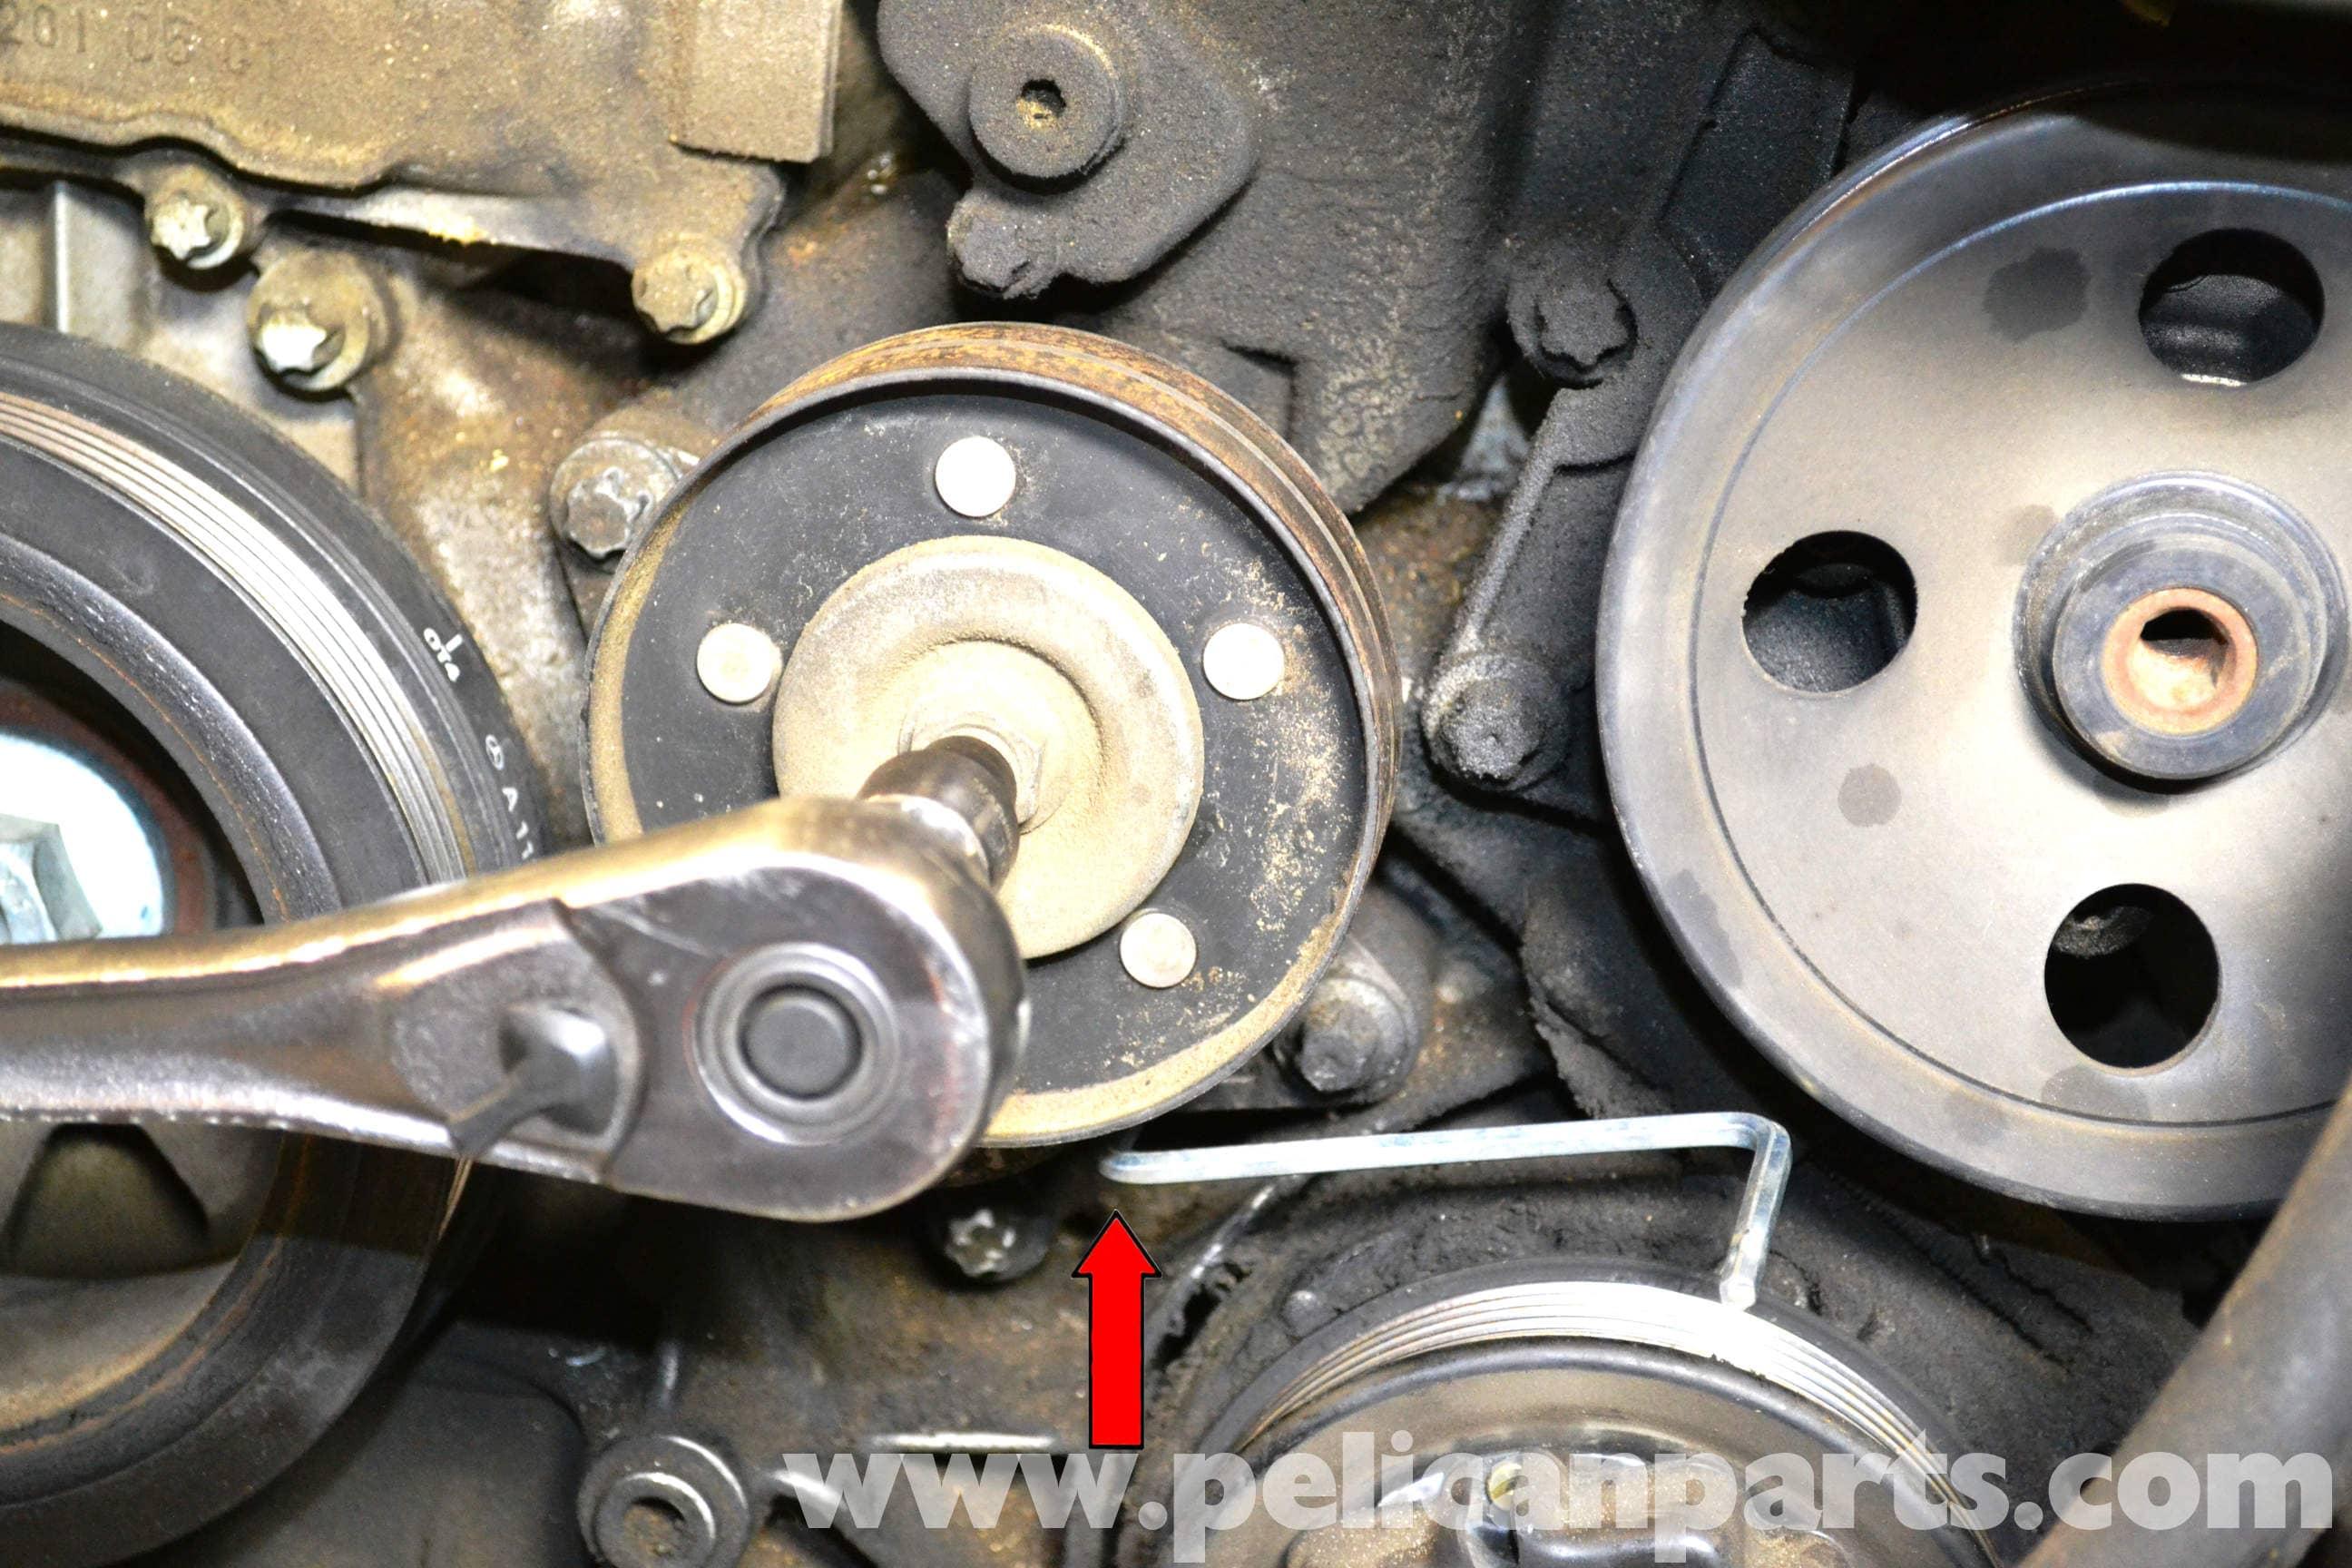 2008 Mercedes Ml320 Engine Diagram Not Lossing Wiring Benz Wire Library Rh 91 Skriptoase De 2000 Diagrams